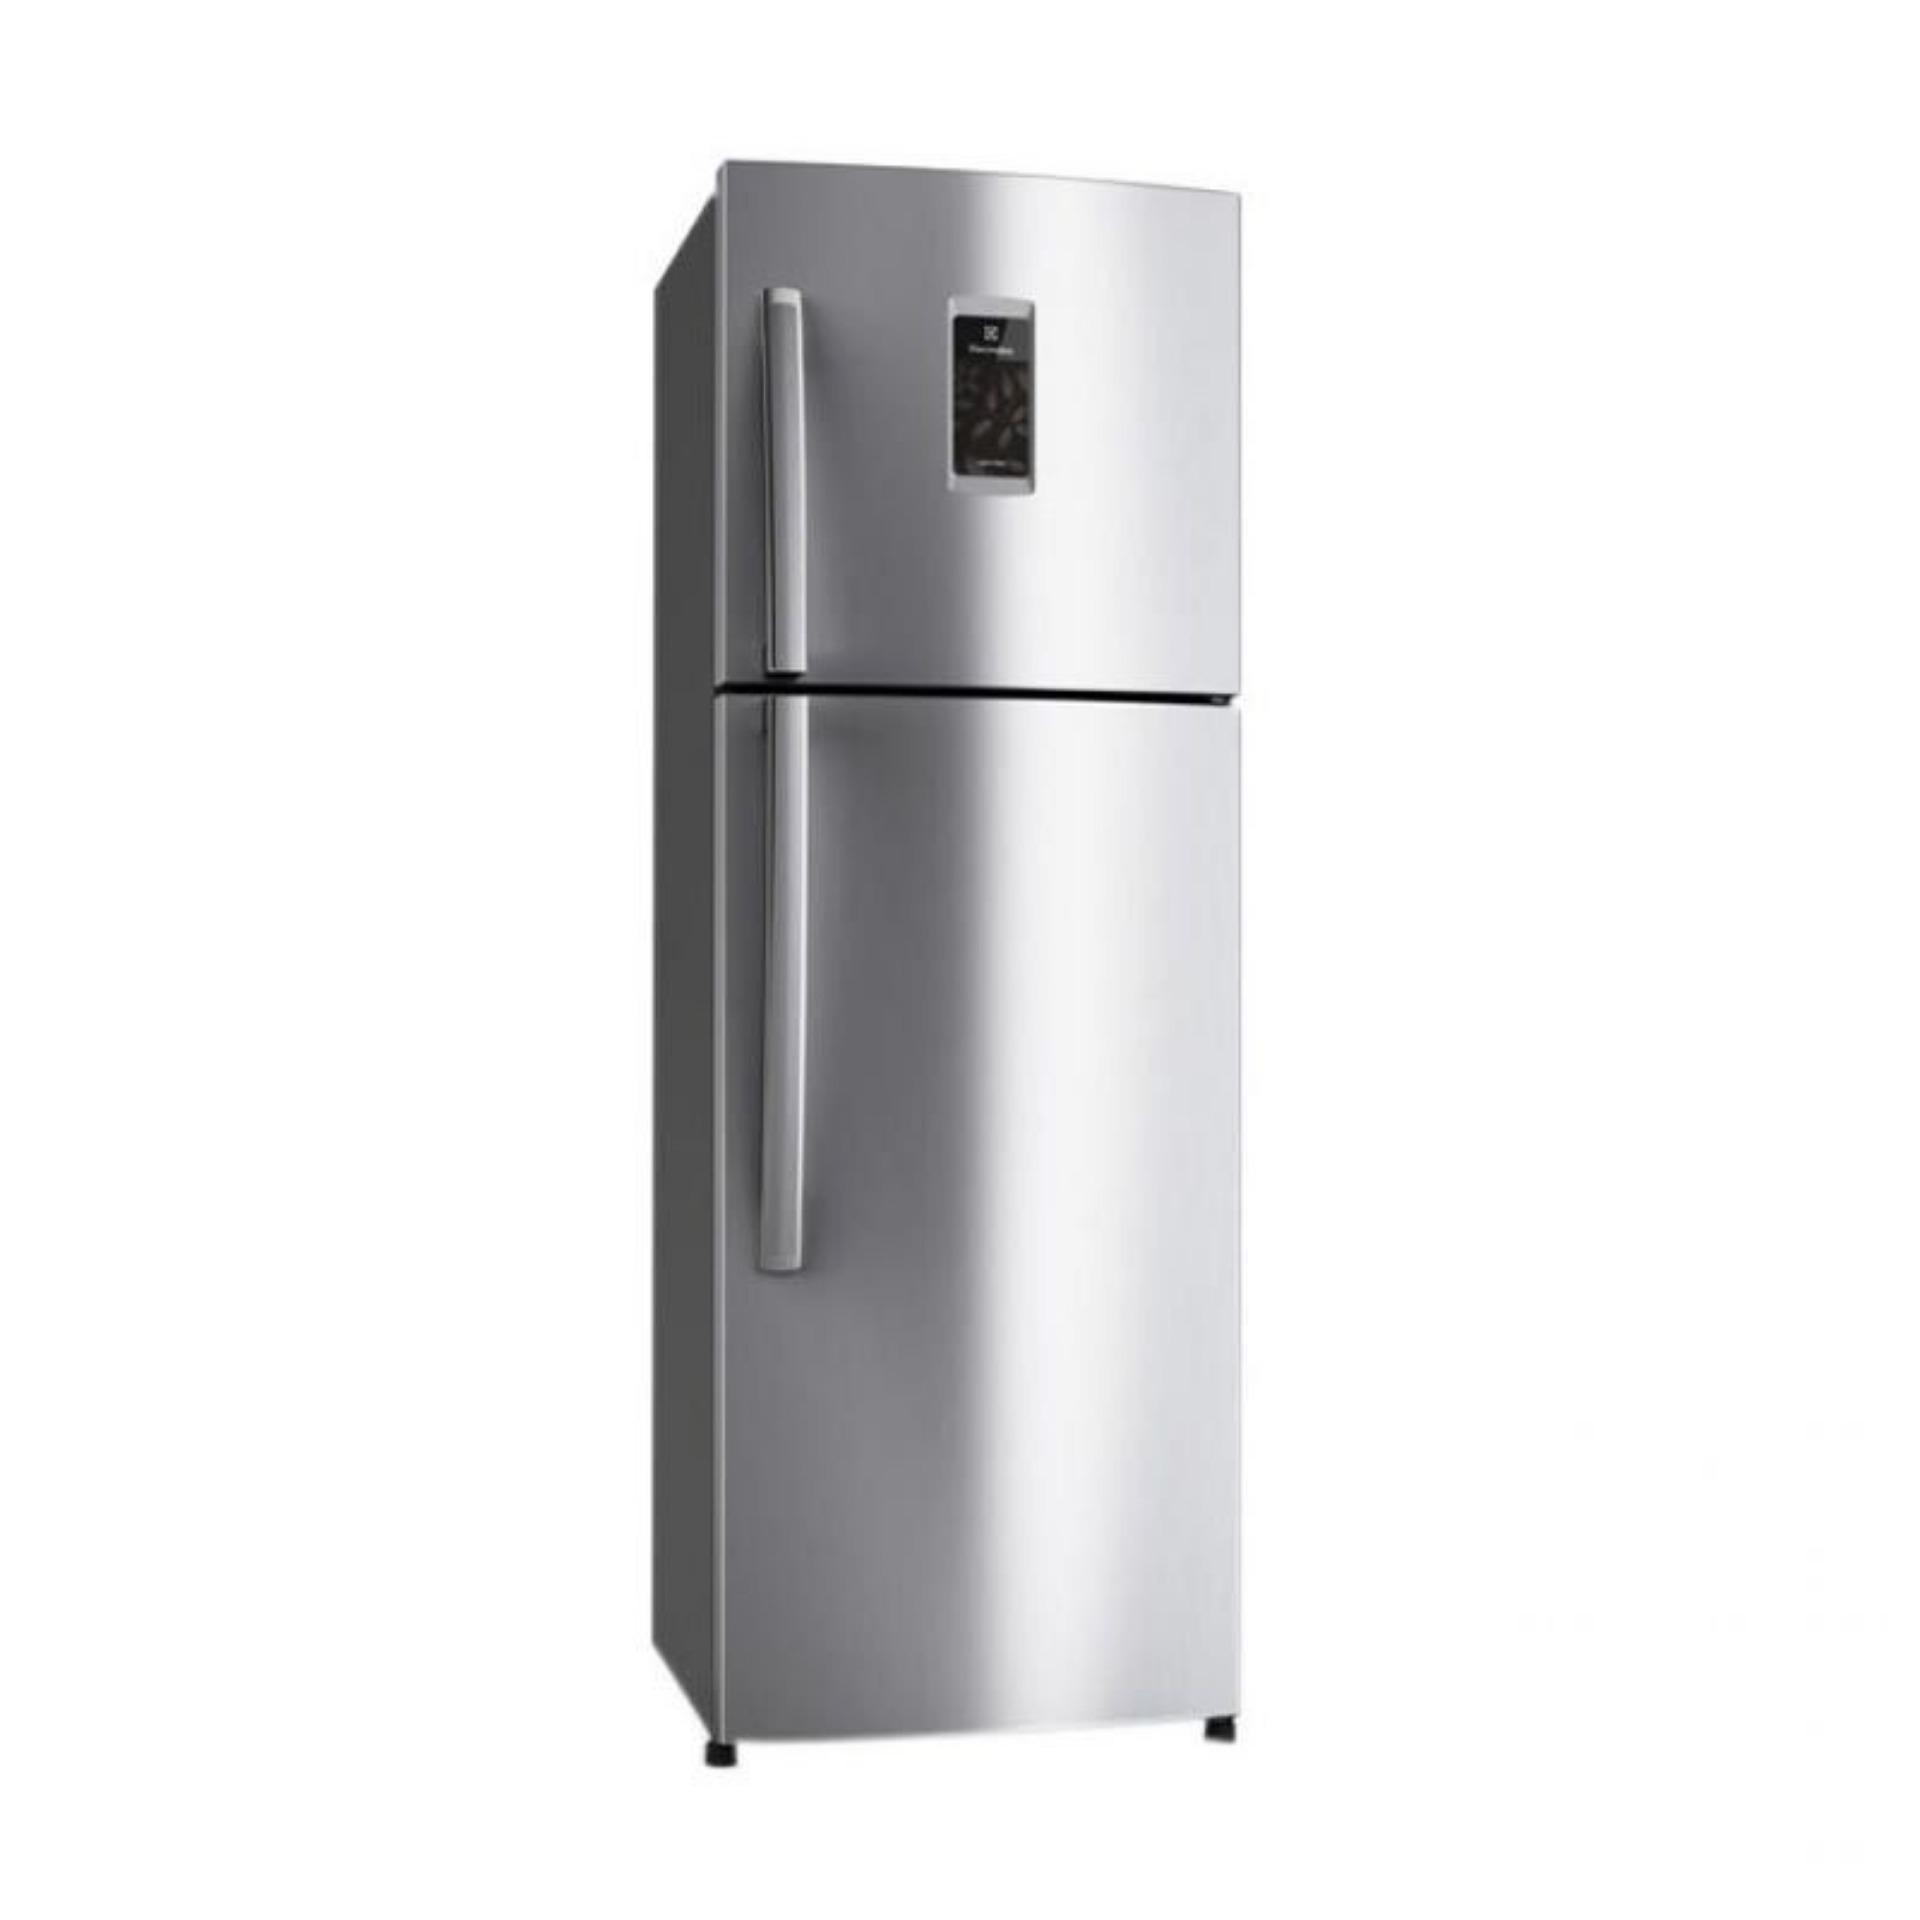 electrolux fridge. electrolux fridge o